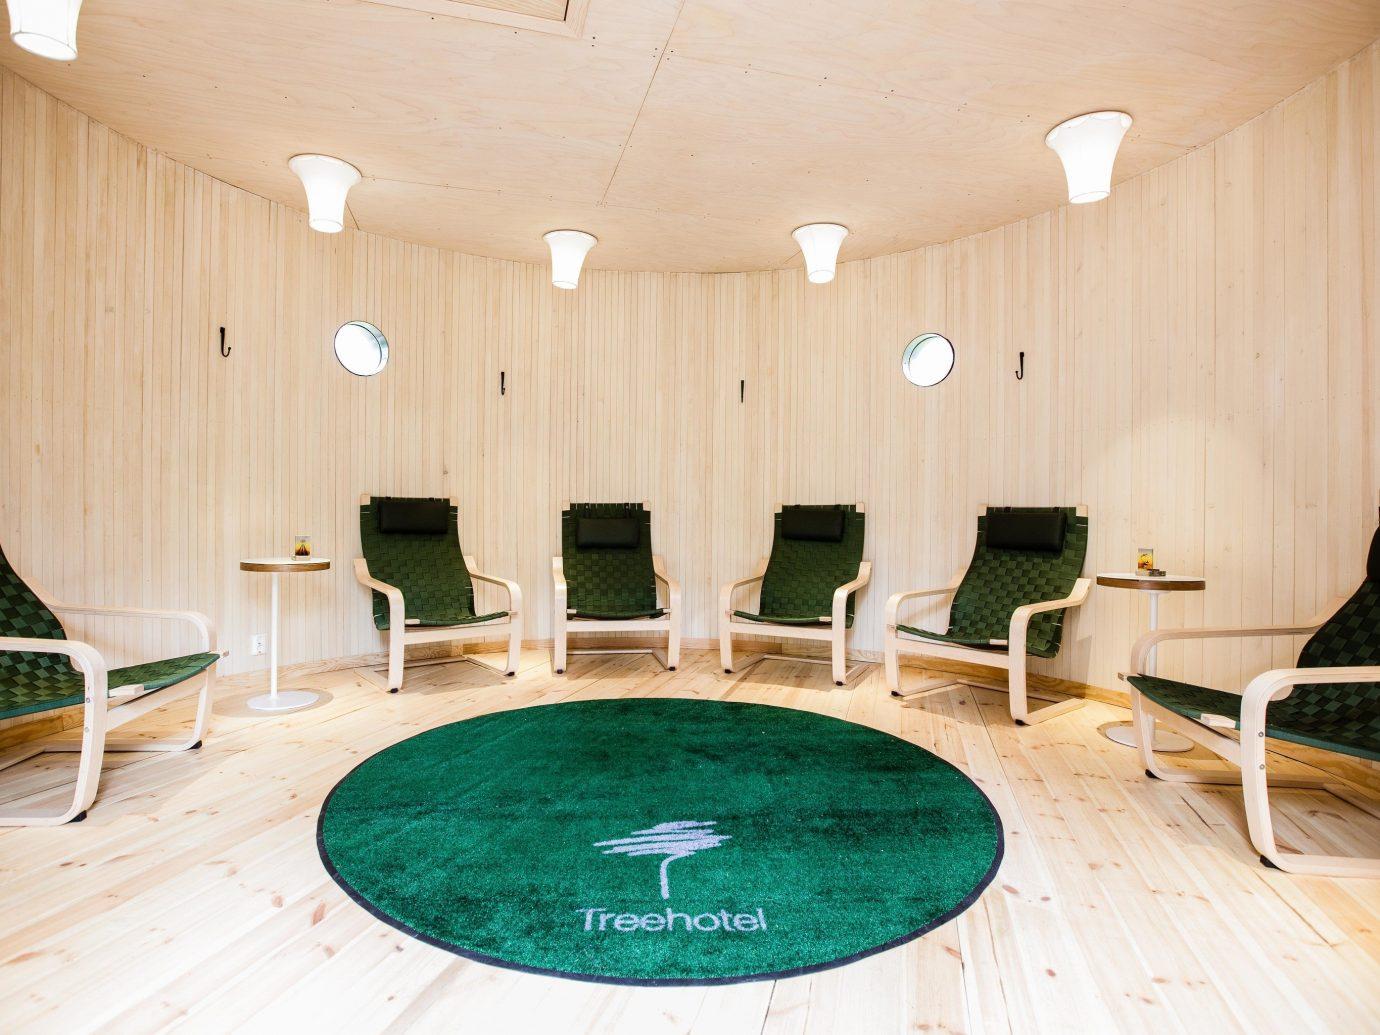 Boutique Hotels Sweden table room furniture floor interior design wood flooring chair recreation room amenity